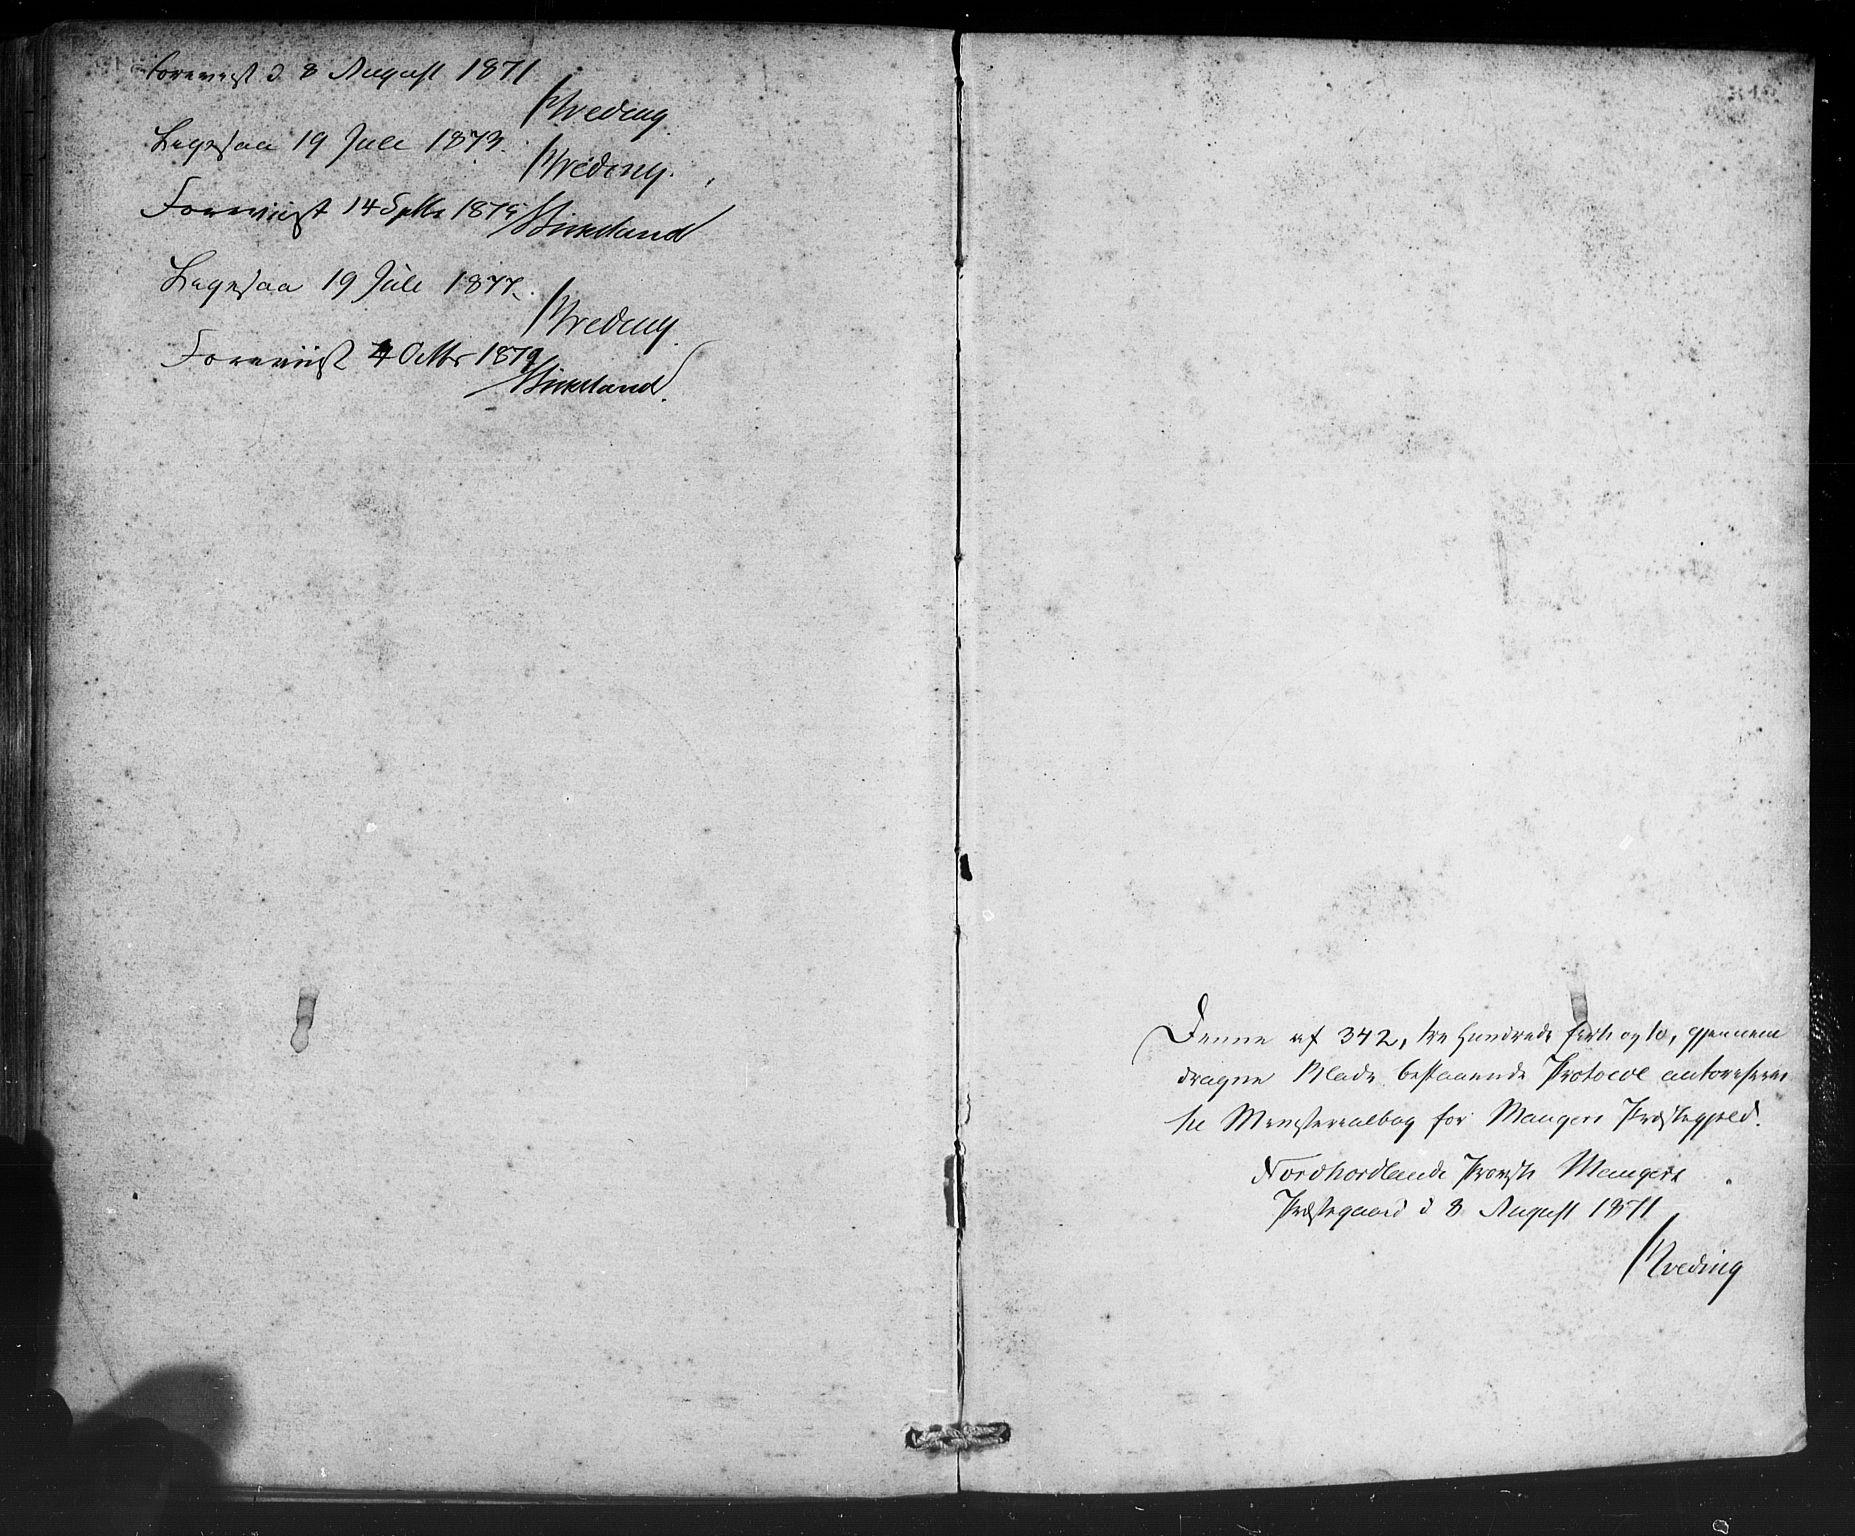 SAB, Manger sokneprestembete, H/Haa: Ministerialbok nr. A 8, 1871-1880